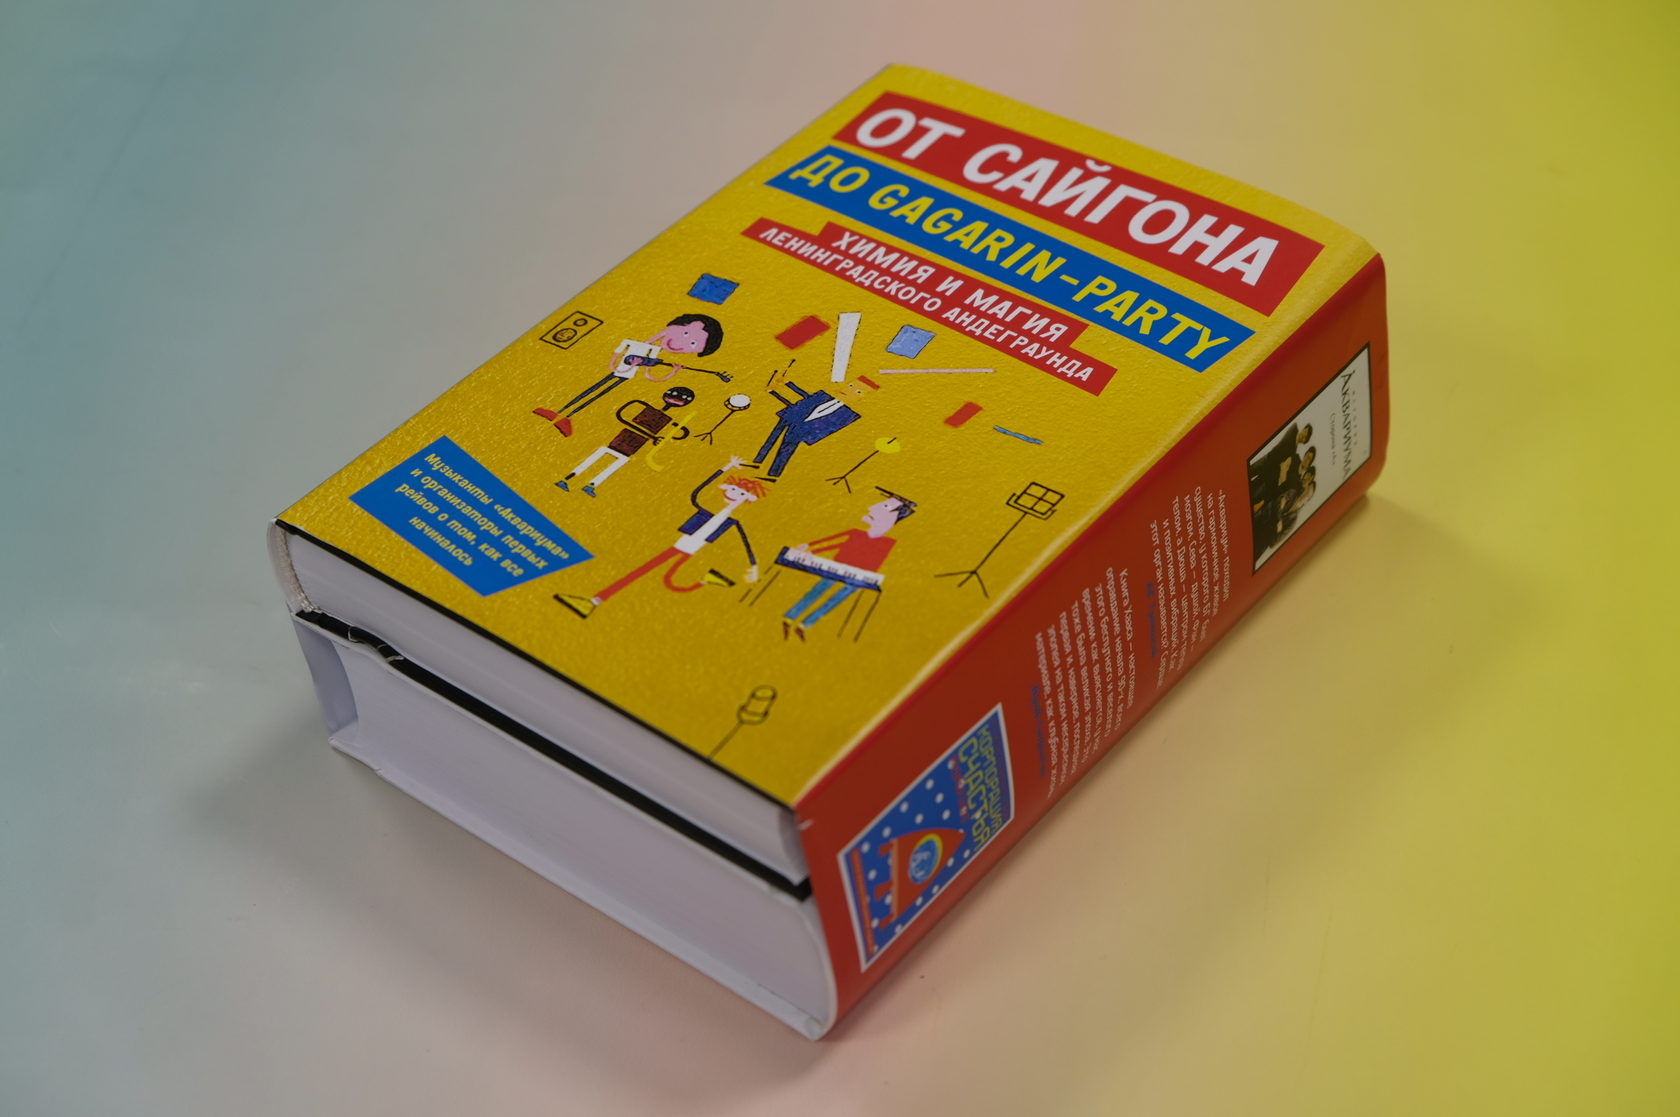 «От Сайгона до Gagarin-party. Комплект из 2-х книг» 978-5-386-12643-8